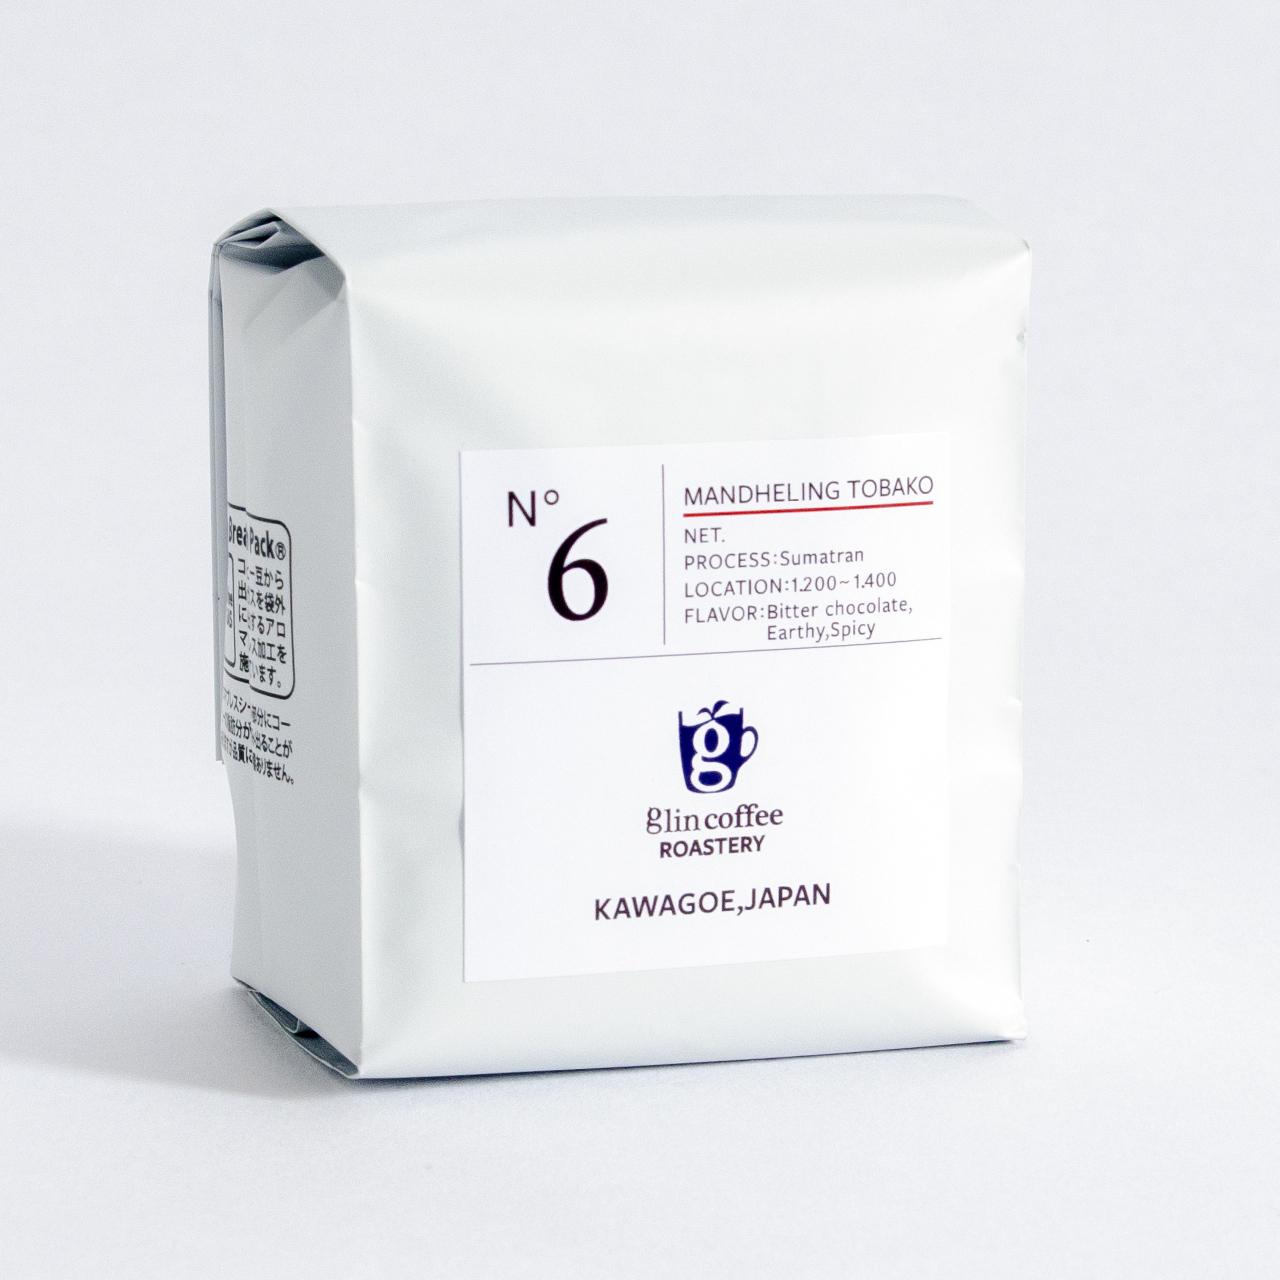 No.6  マンデリン トバコ 150g 自家焙煎コーヒー豆 『苦味とコクが特徴』